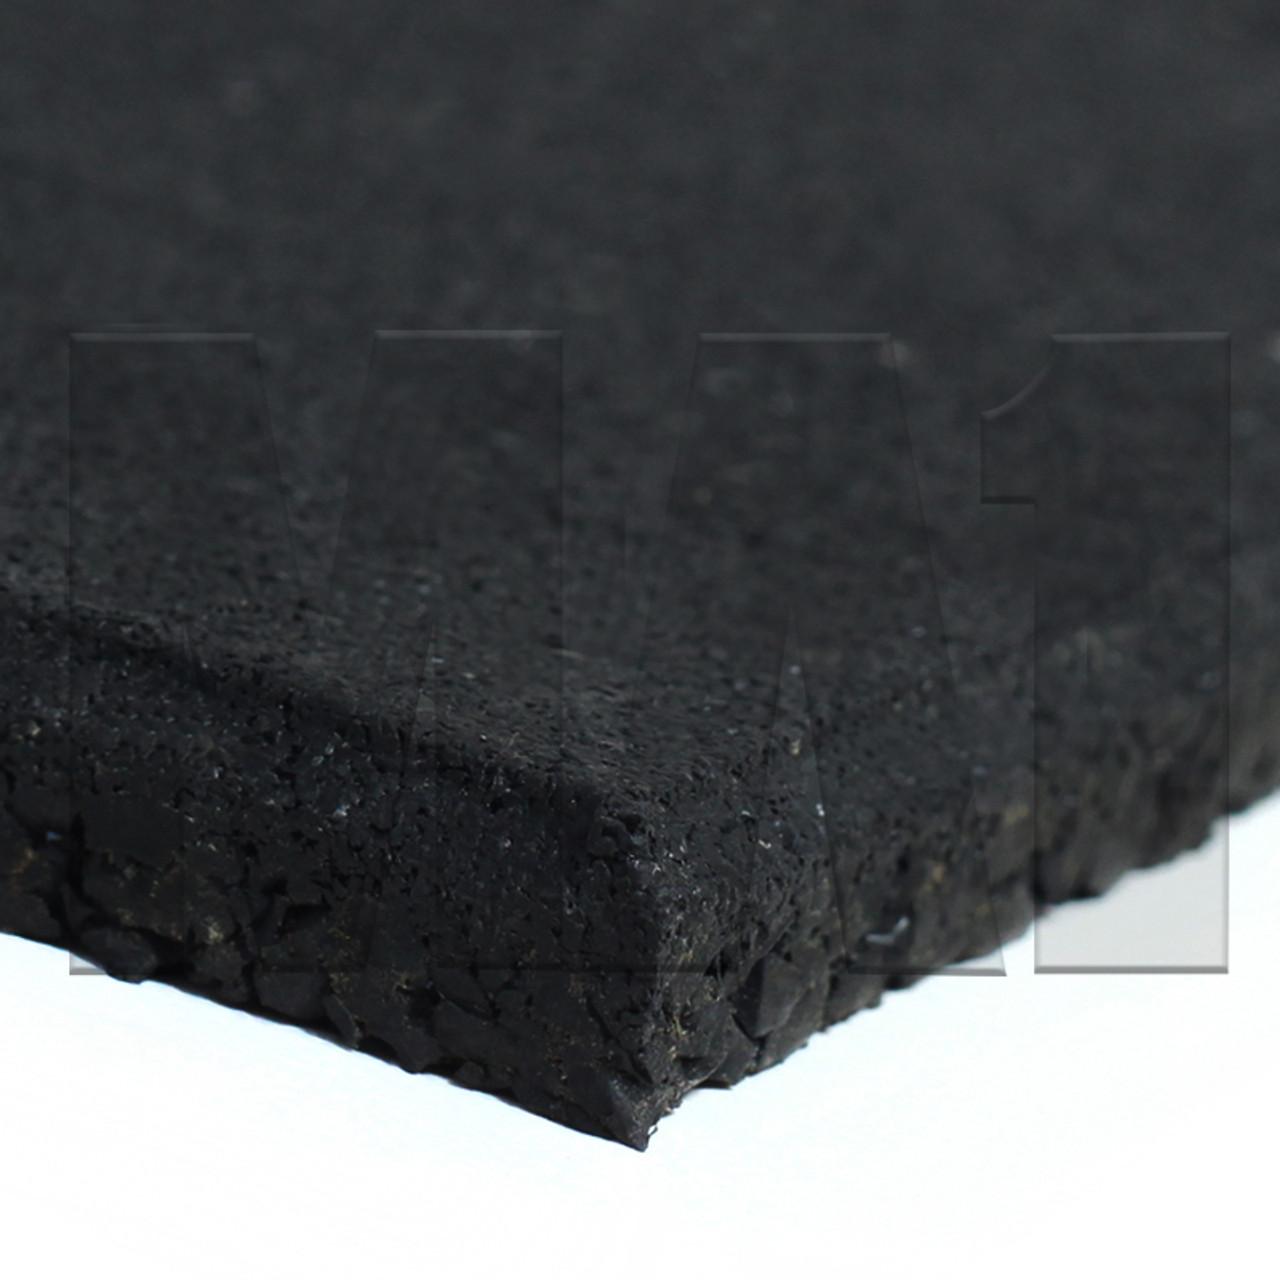 MA1 Rubber Gym Mat Flooring - 1M x 1M x 15mm, Plain Black